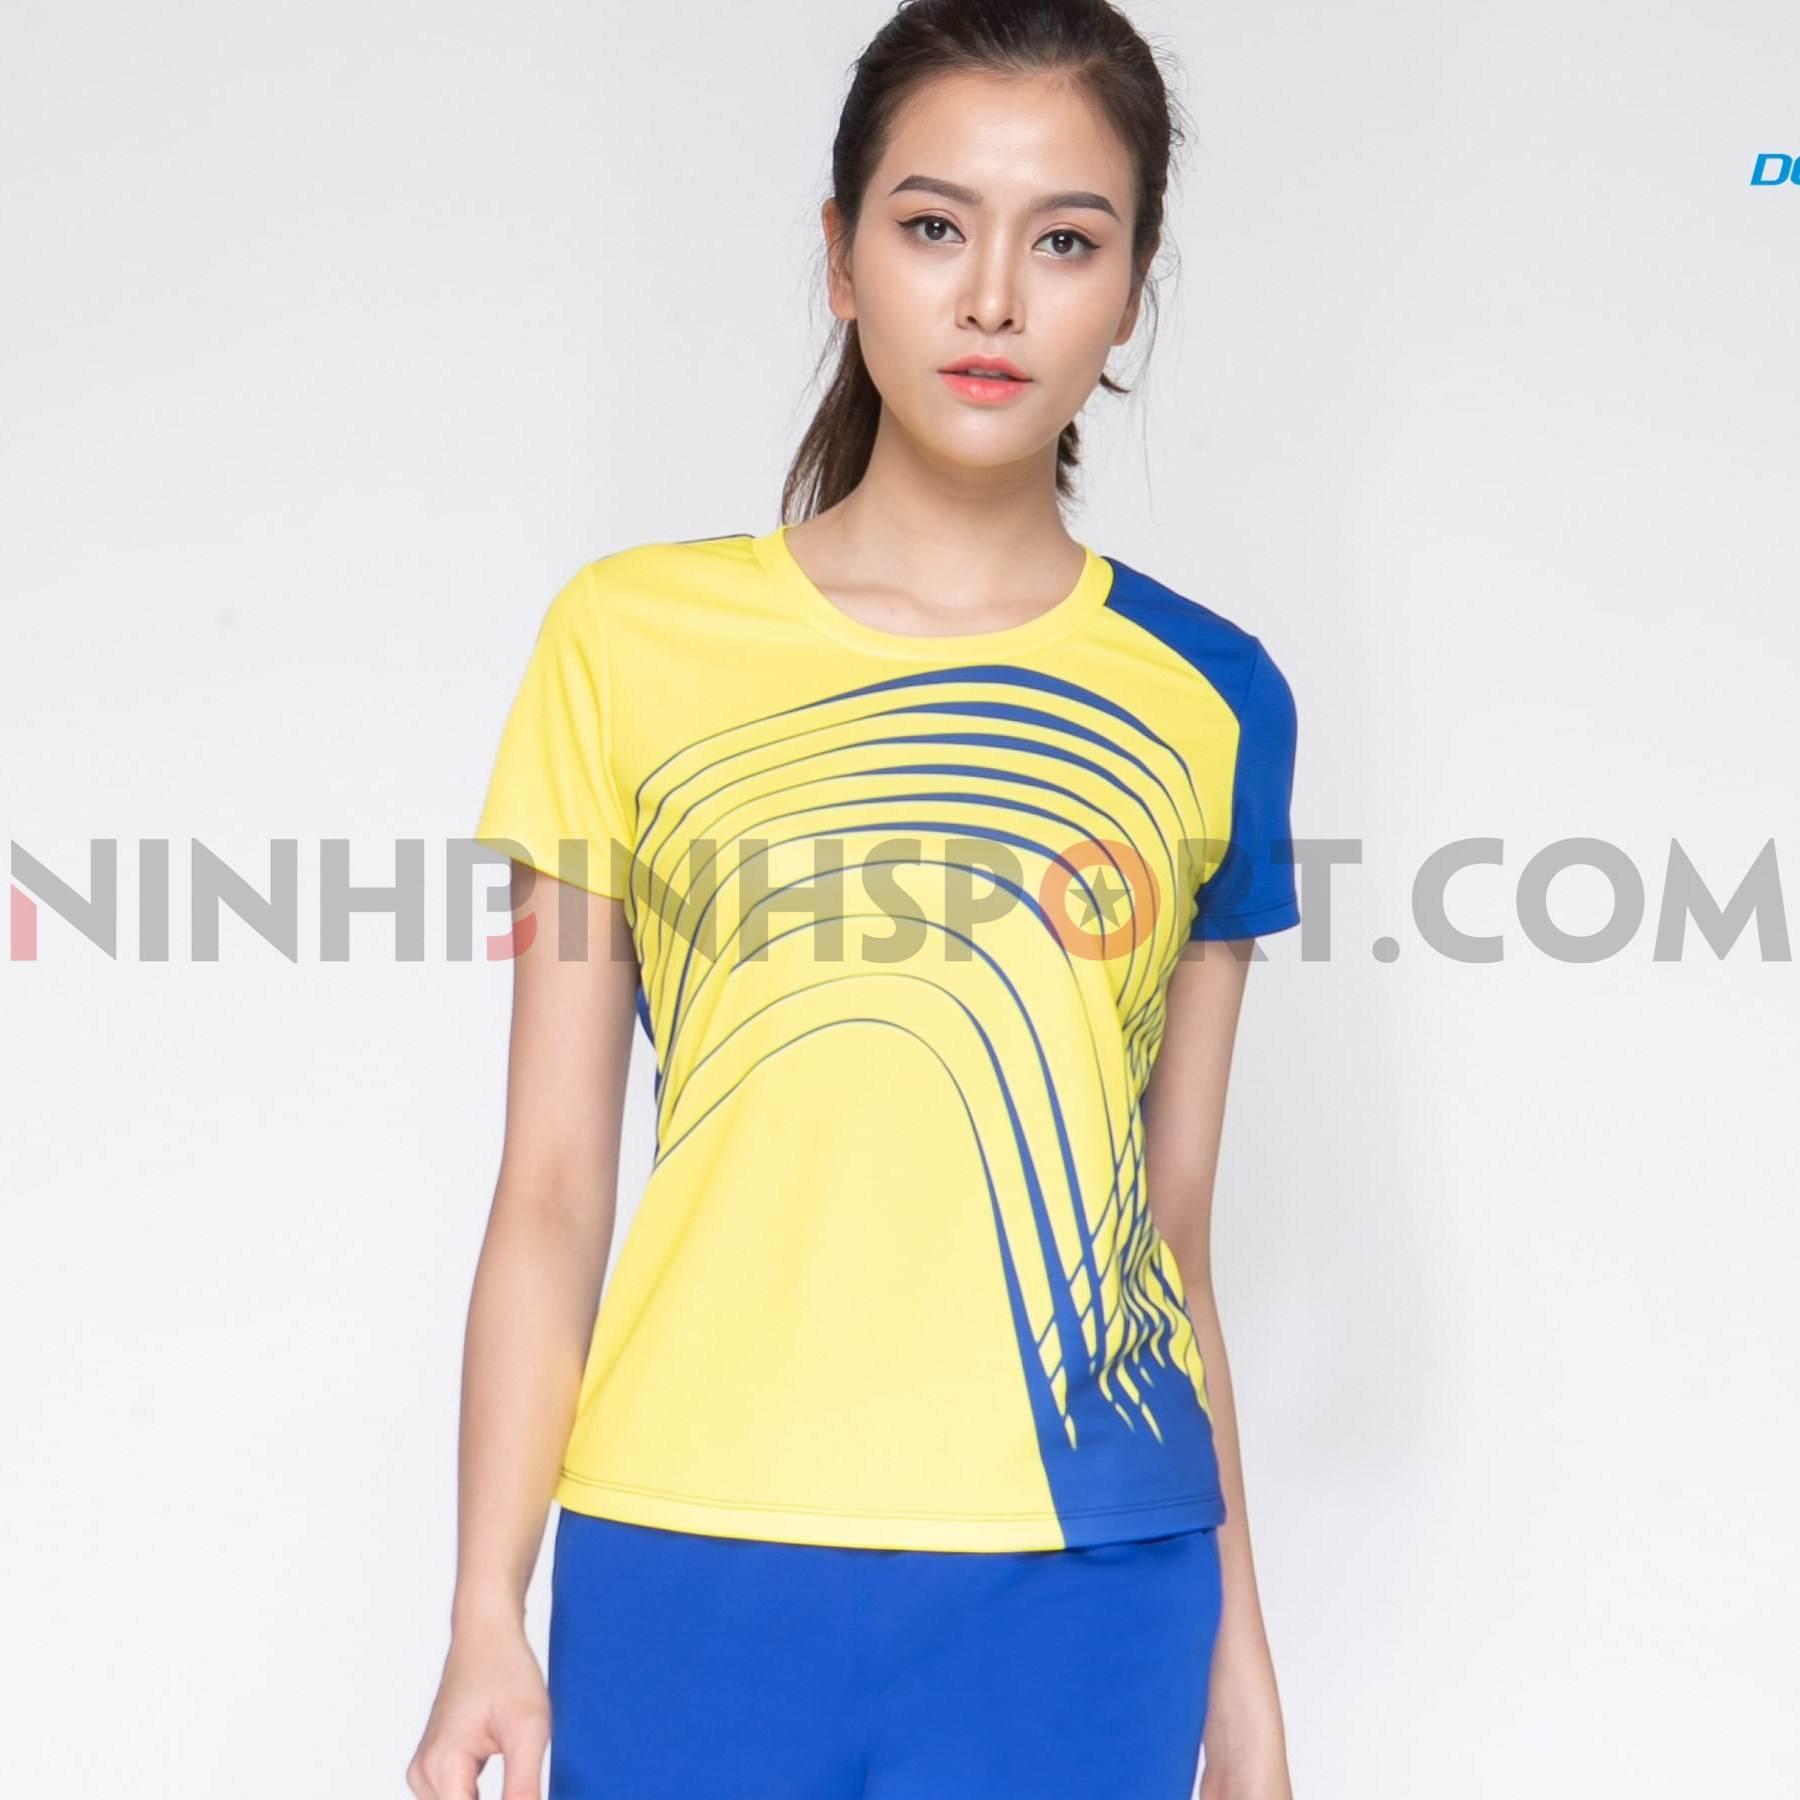 Áo thể thao nữ Donex AC-3602-04-06